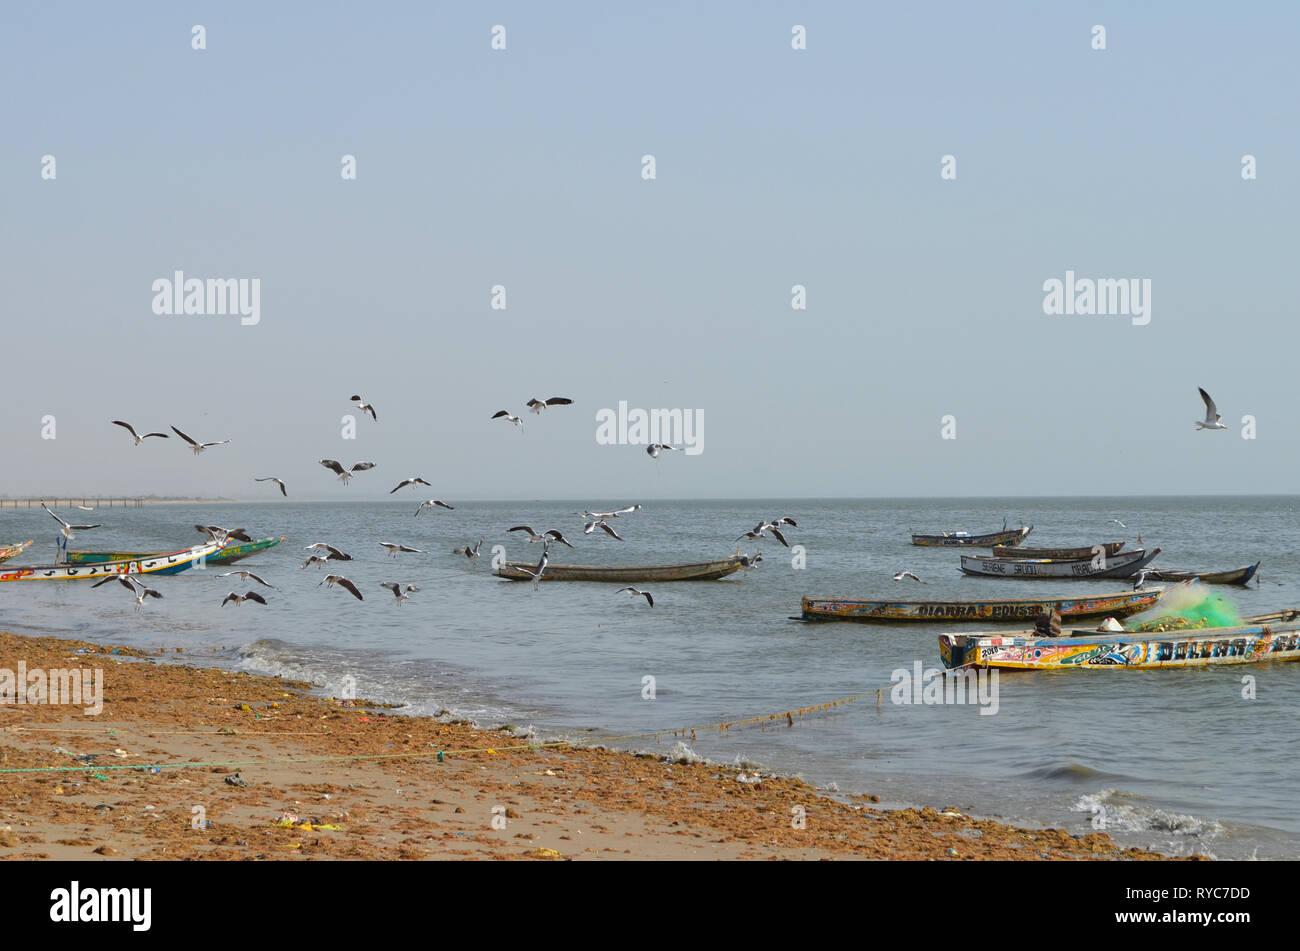 Artisanal pirogues at the beach of Djiffère, Senegal Stock Photo